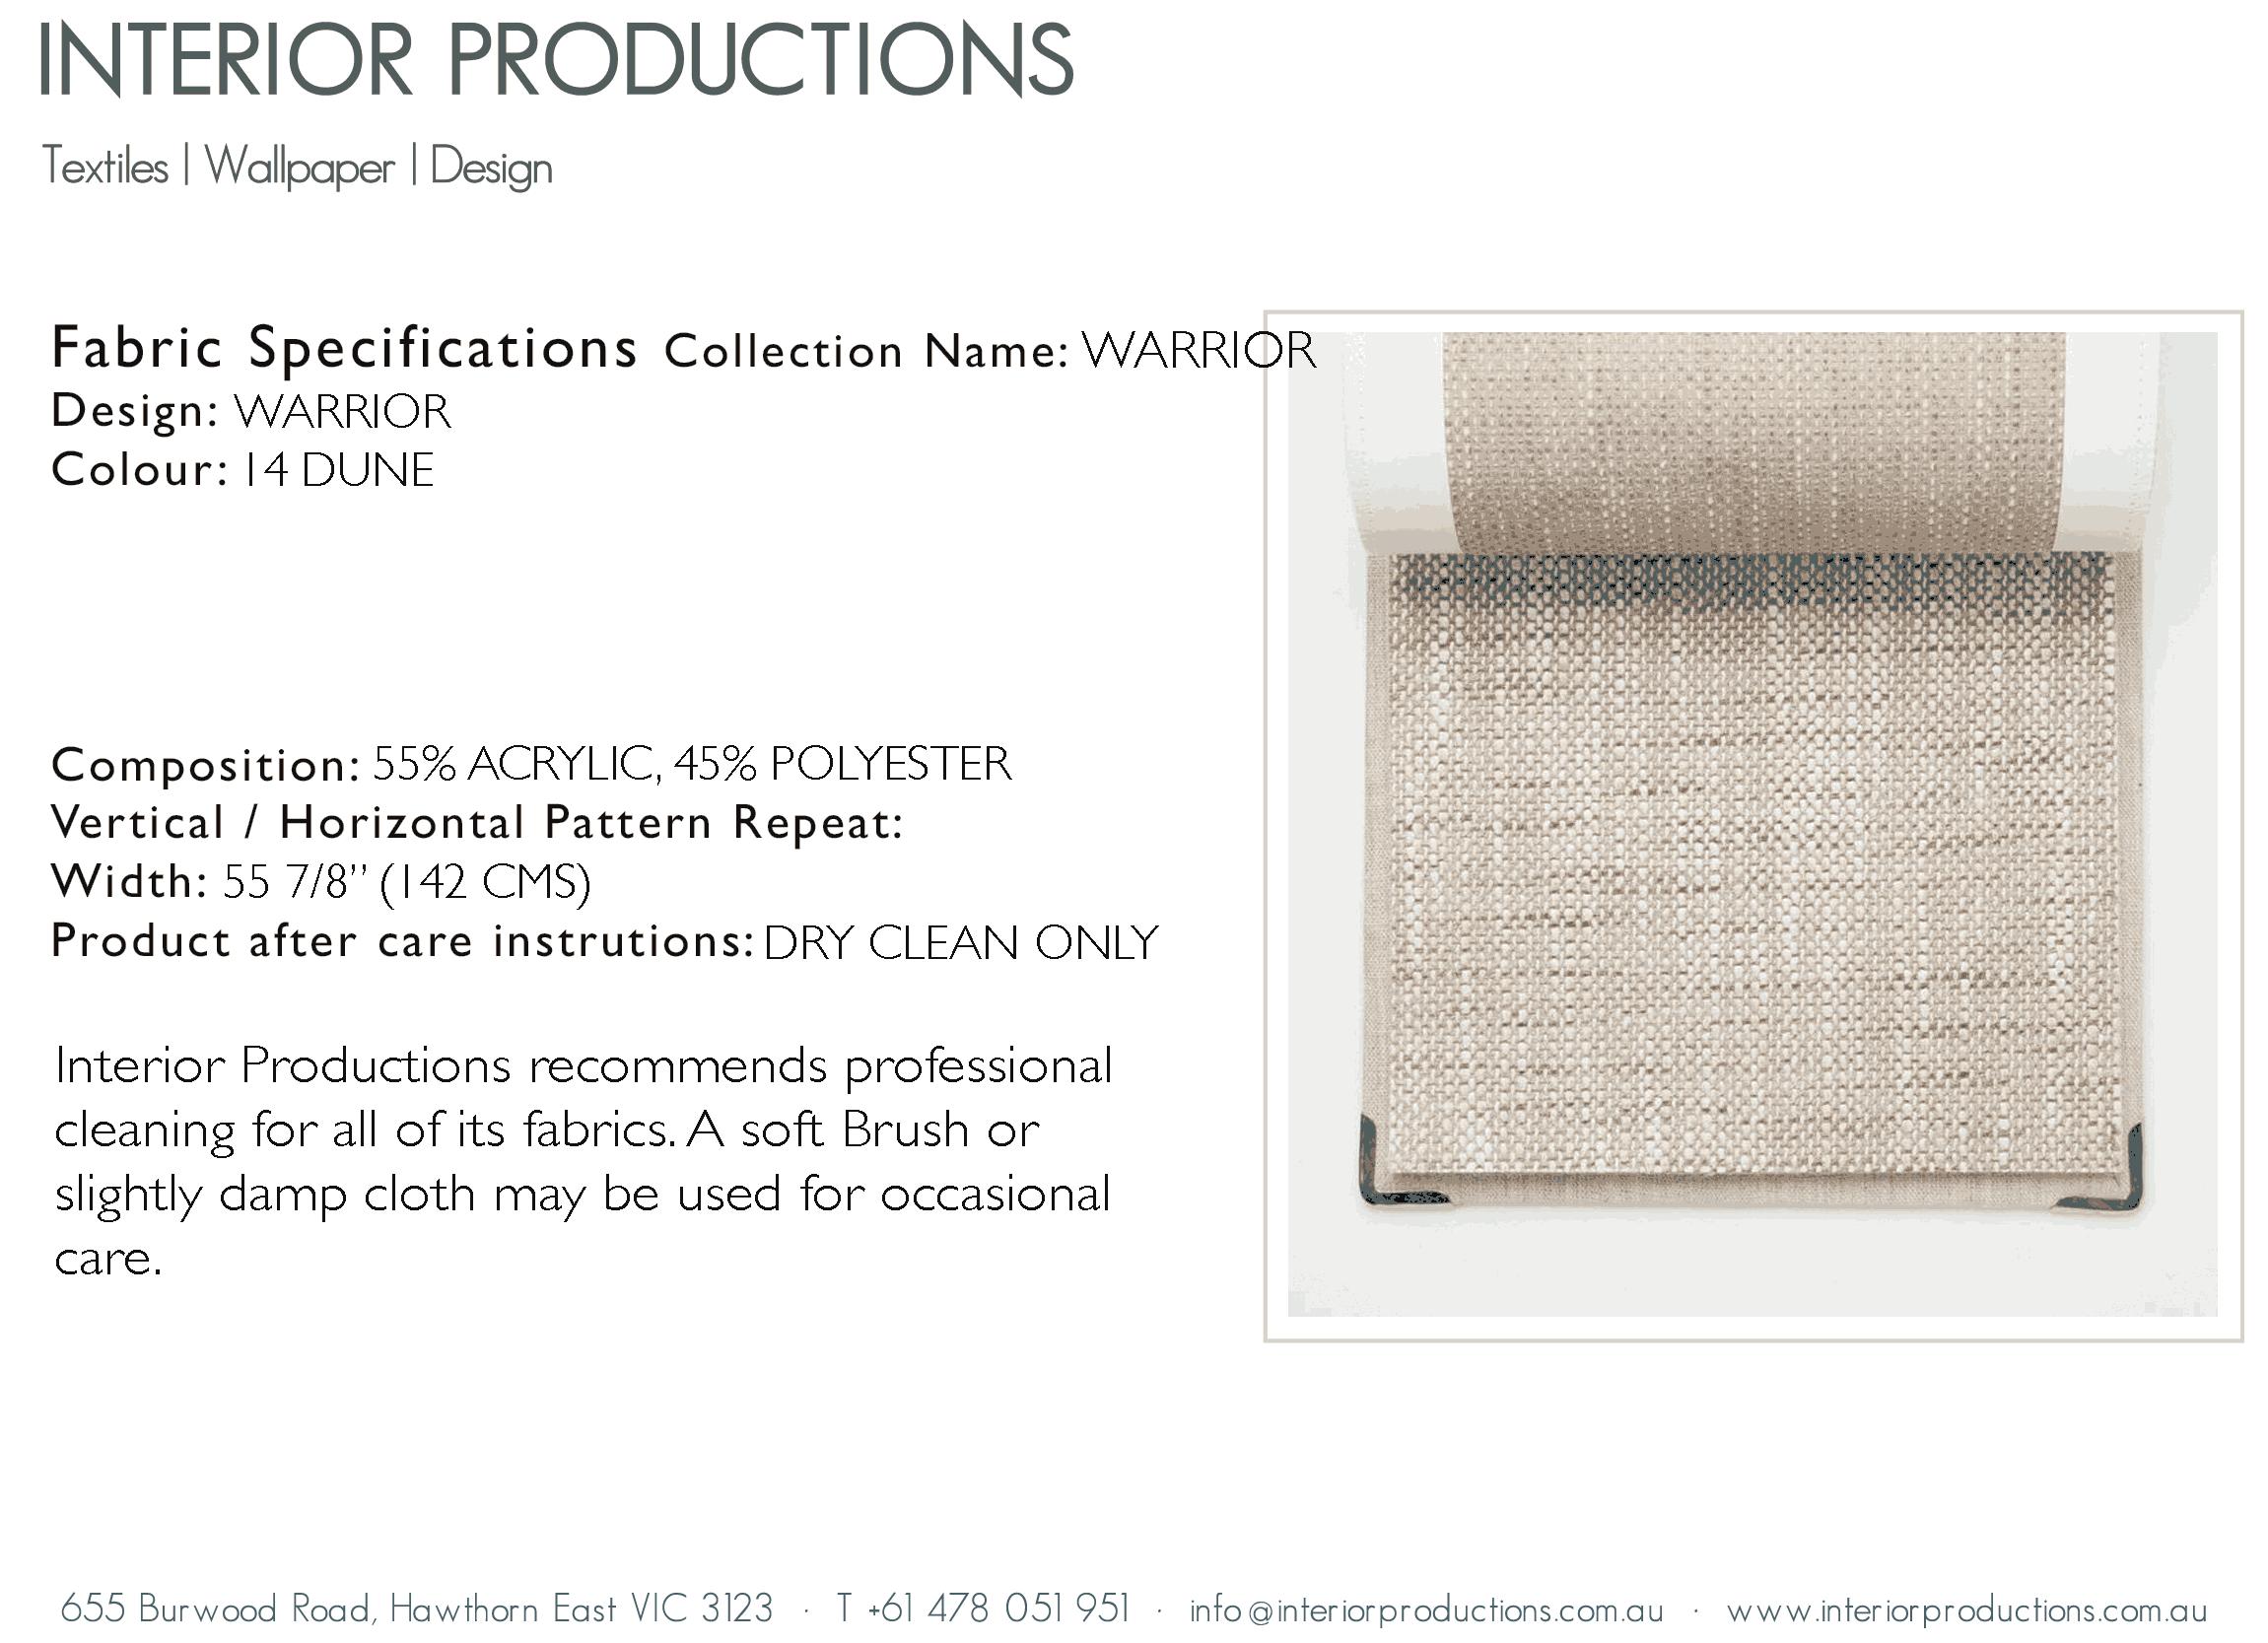 interior_productions_WARRIOR---14-DUNE